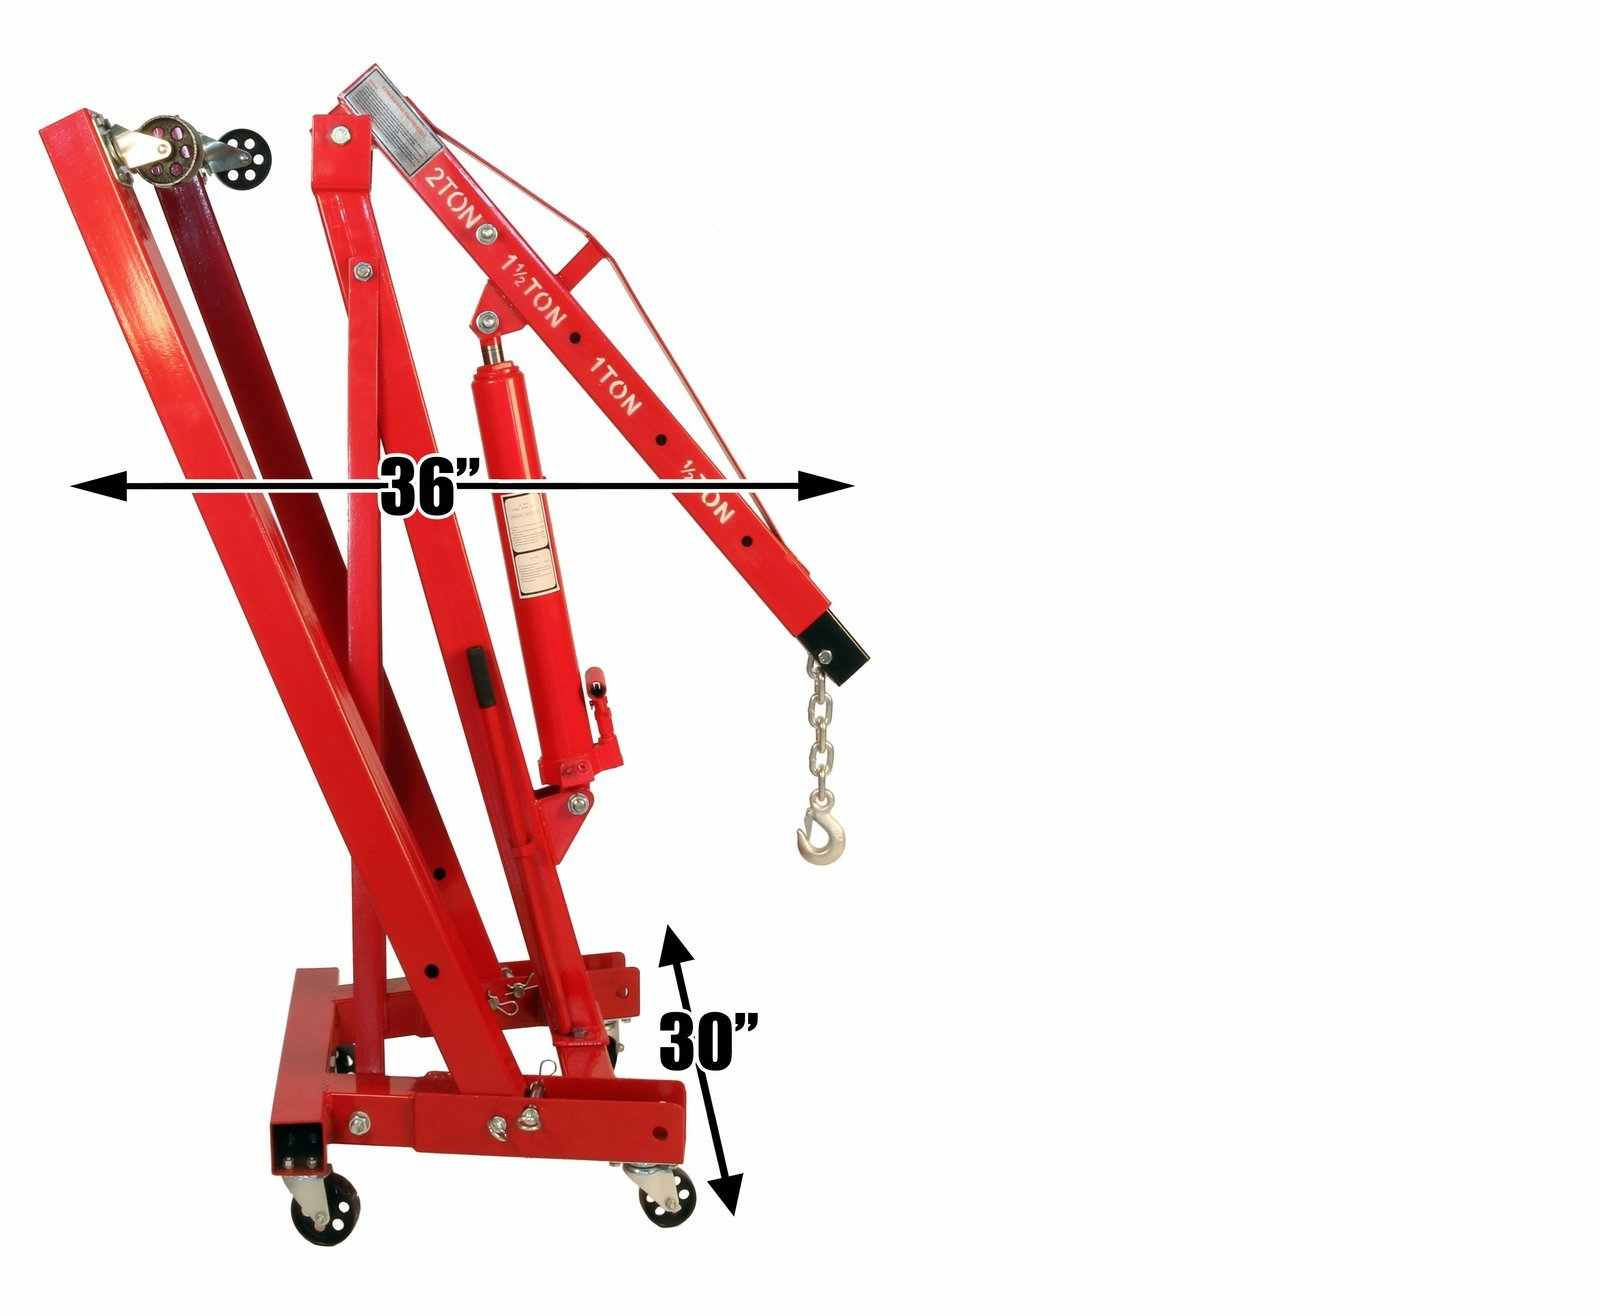 Dragway Tools 2 Ton Folding Hydraulic Engine Hoist Cherry Picker Shop Crane Hoist Lift by Dragway Tools (Image #5)